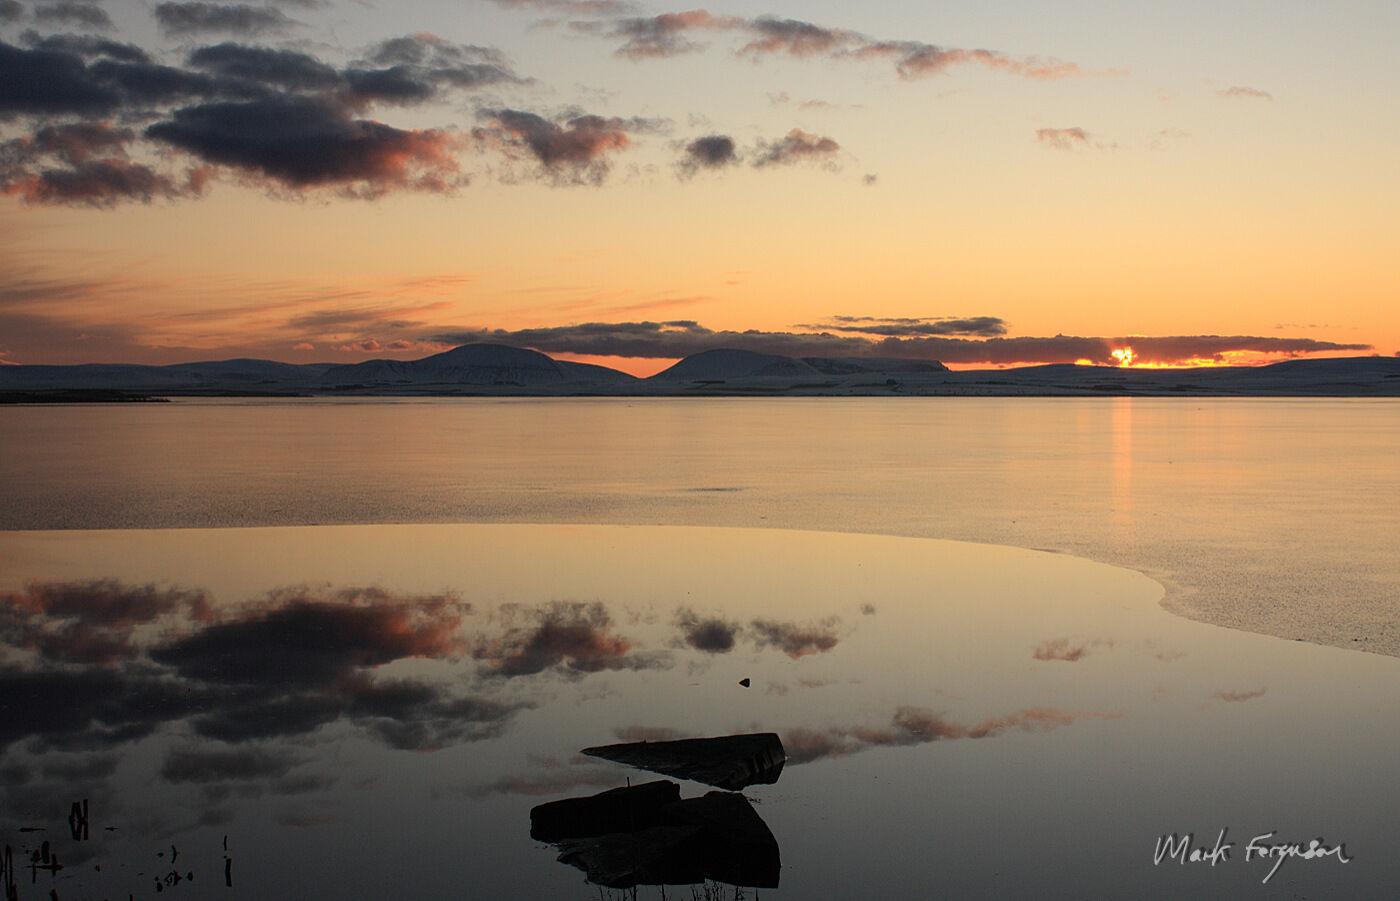 Reflections on Harray Loch